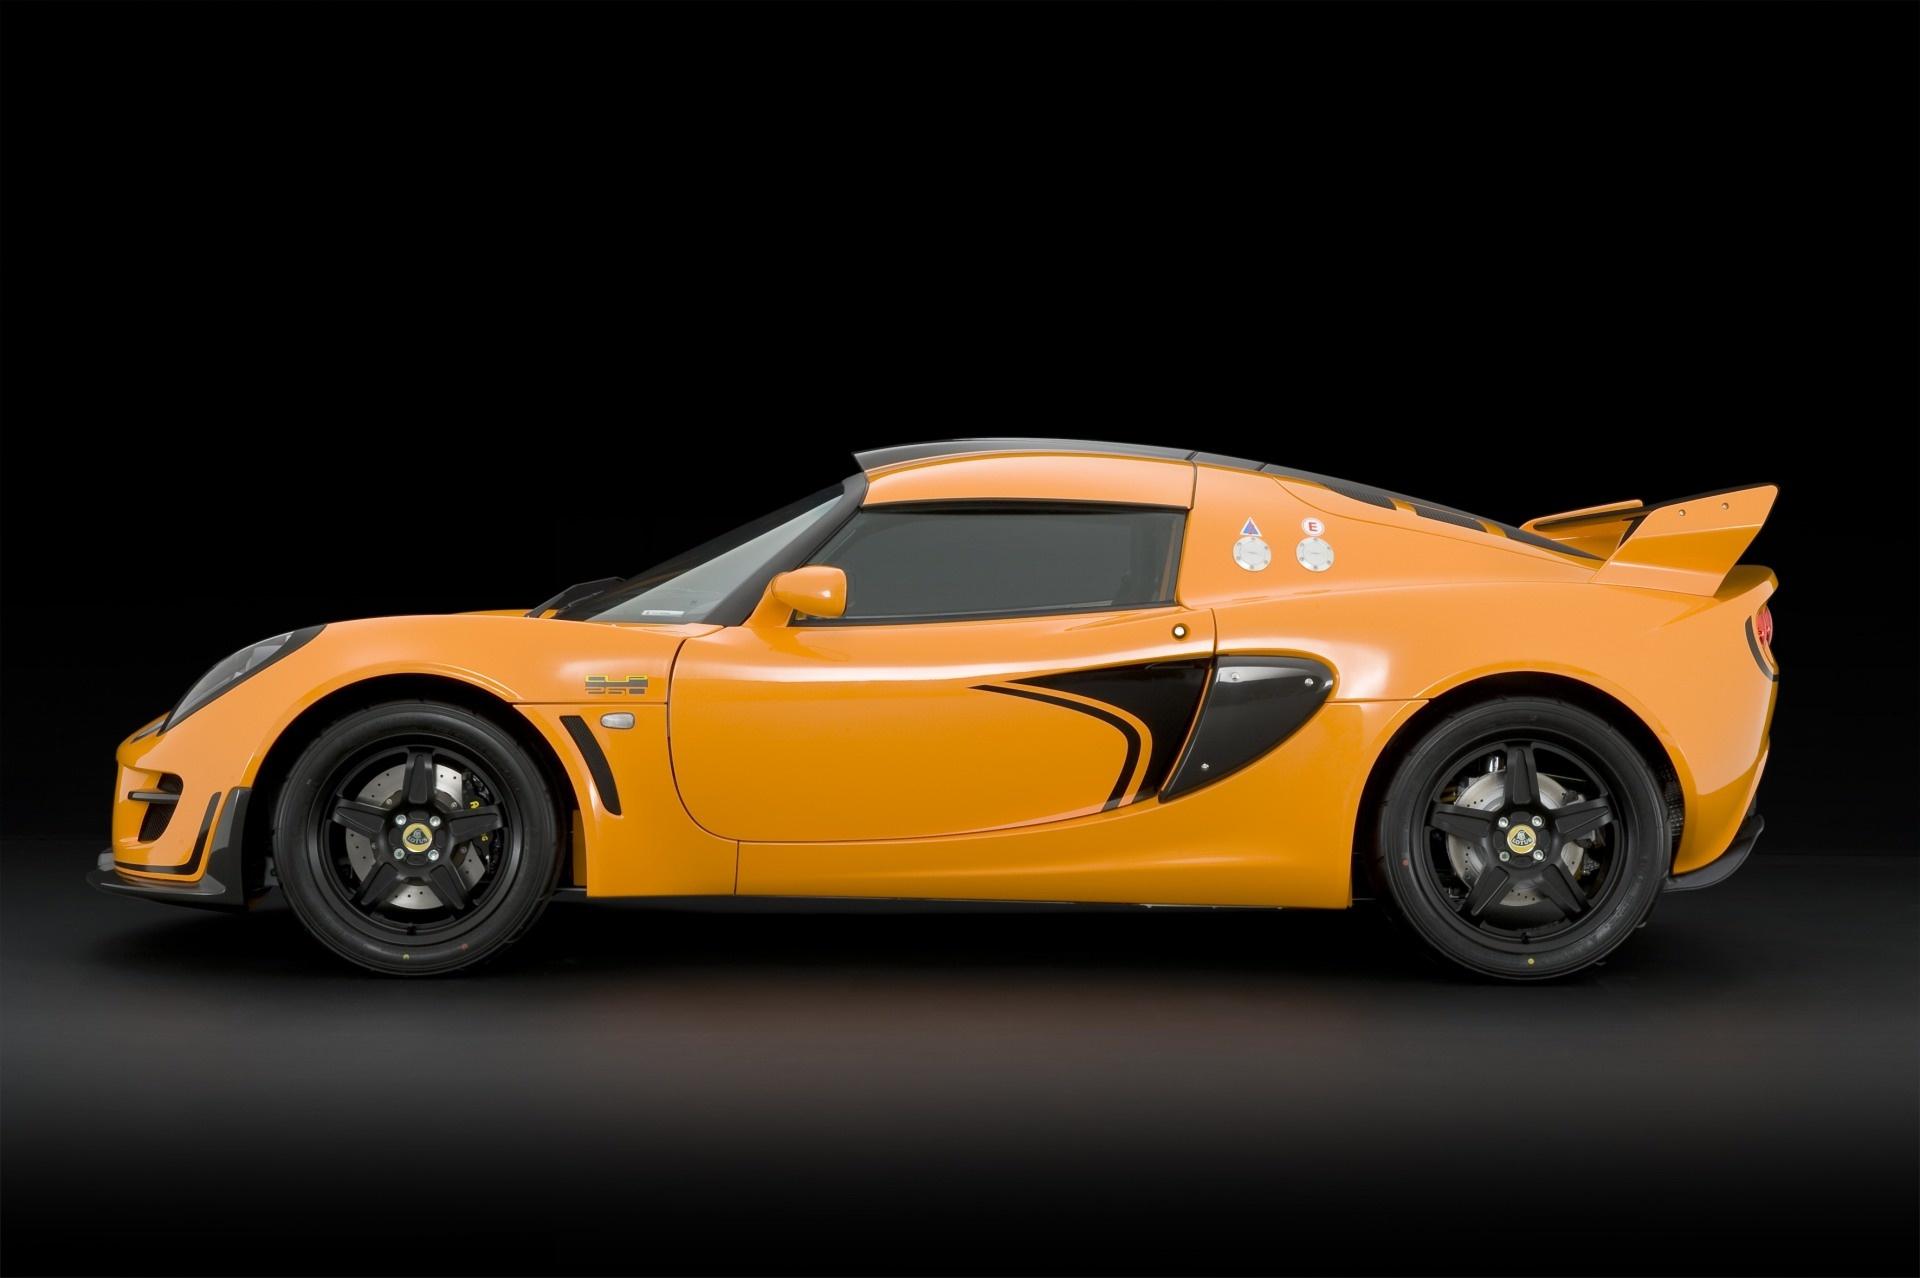 https://www.conceptcarz.com/images/Lotus/2010-Lotus_Exige_Cup_260_Image-01.jpg